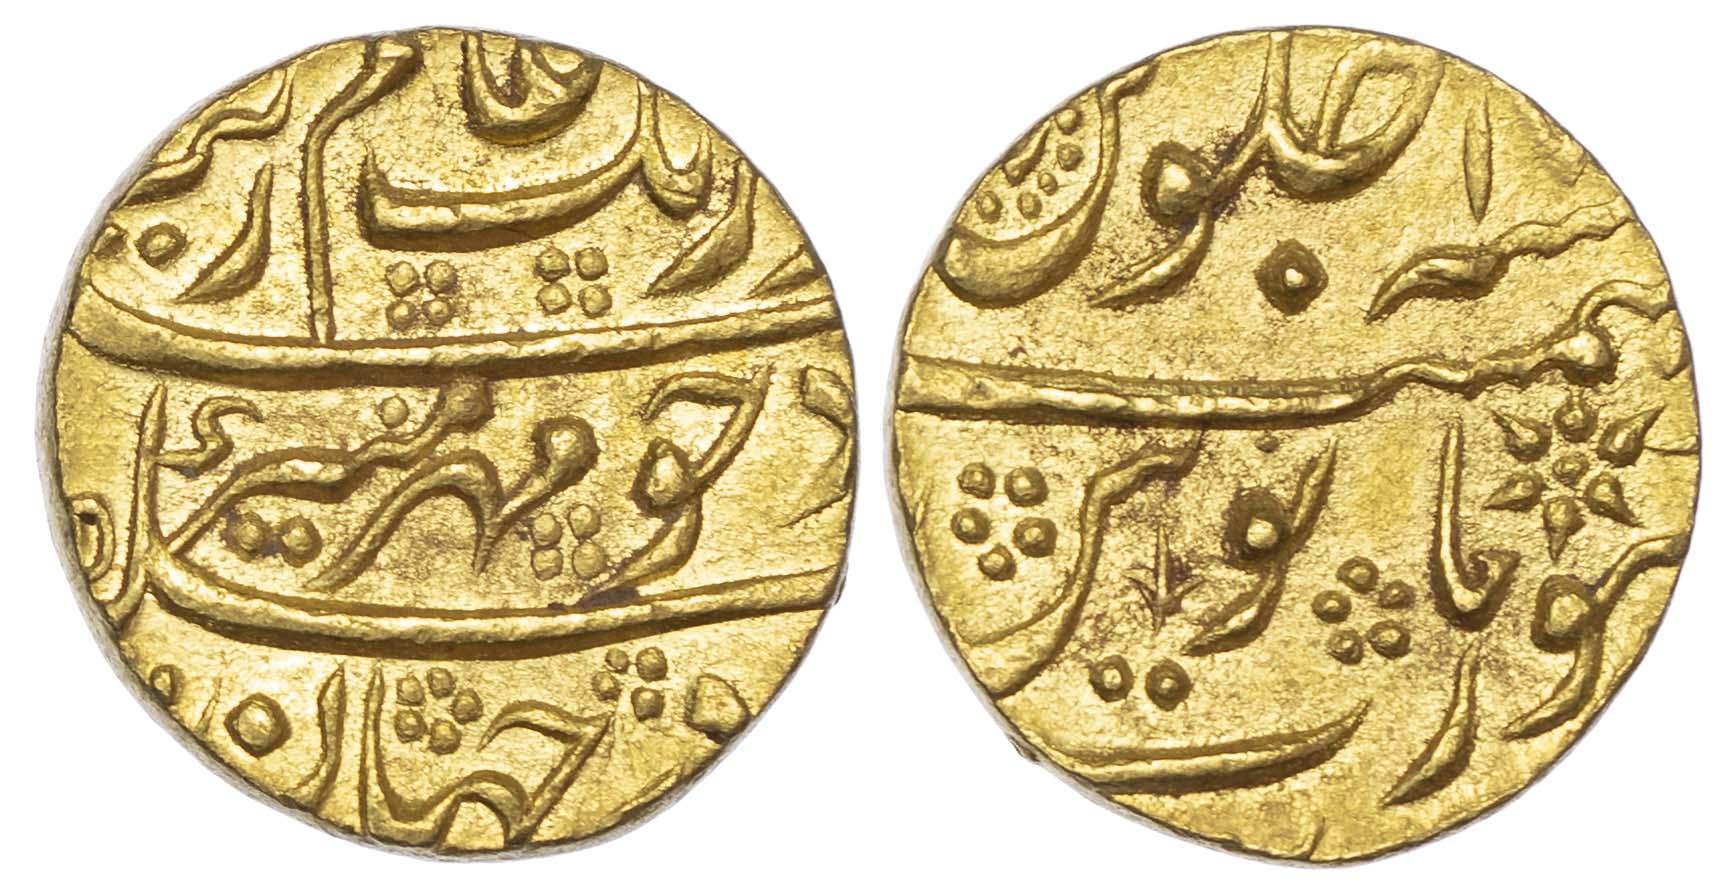 India, Mughal Empire, Aurangzeb Alamgir (AD 1658-1707), gold Mohur